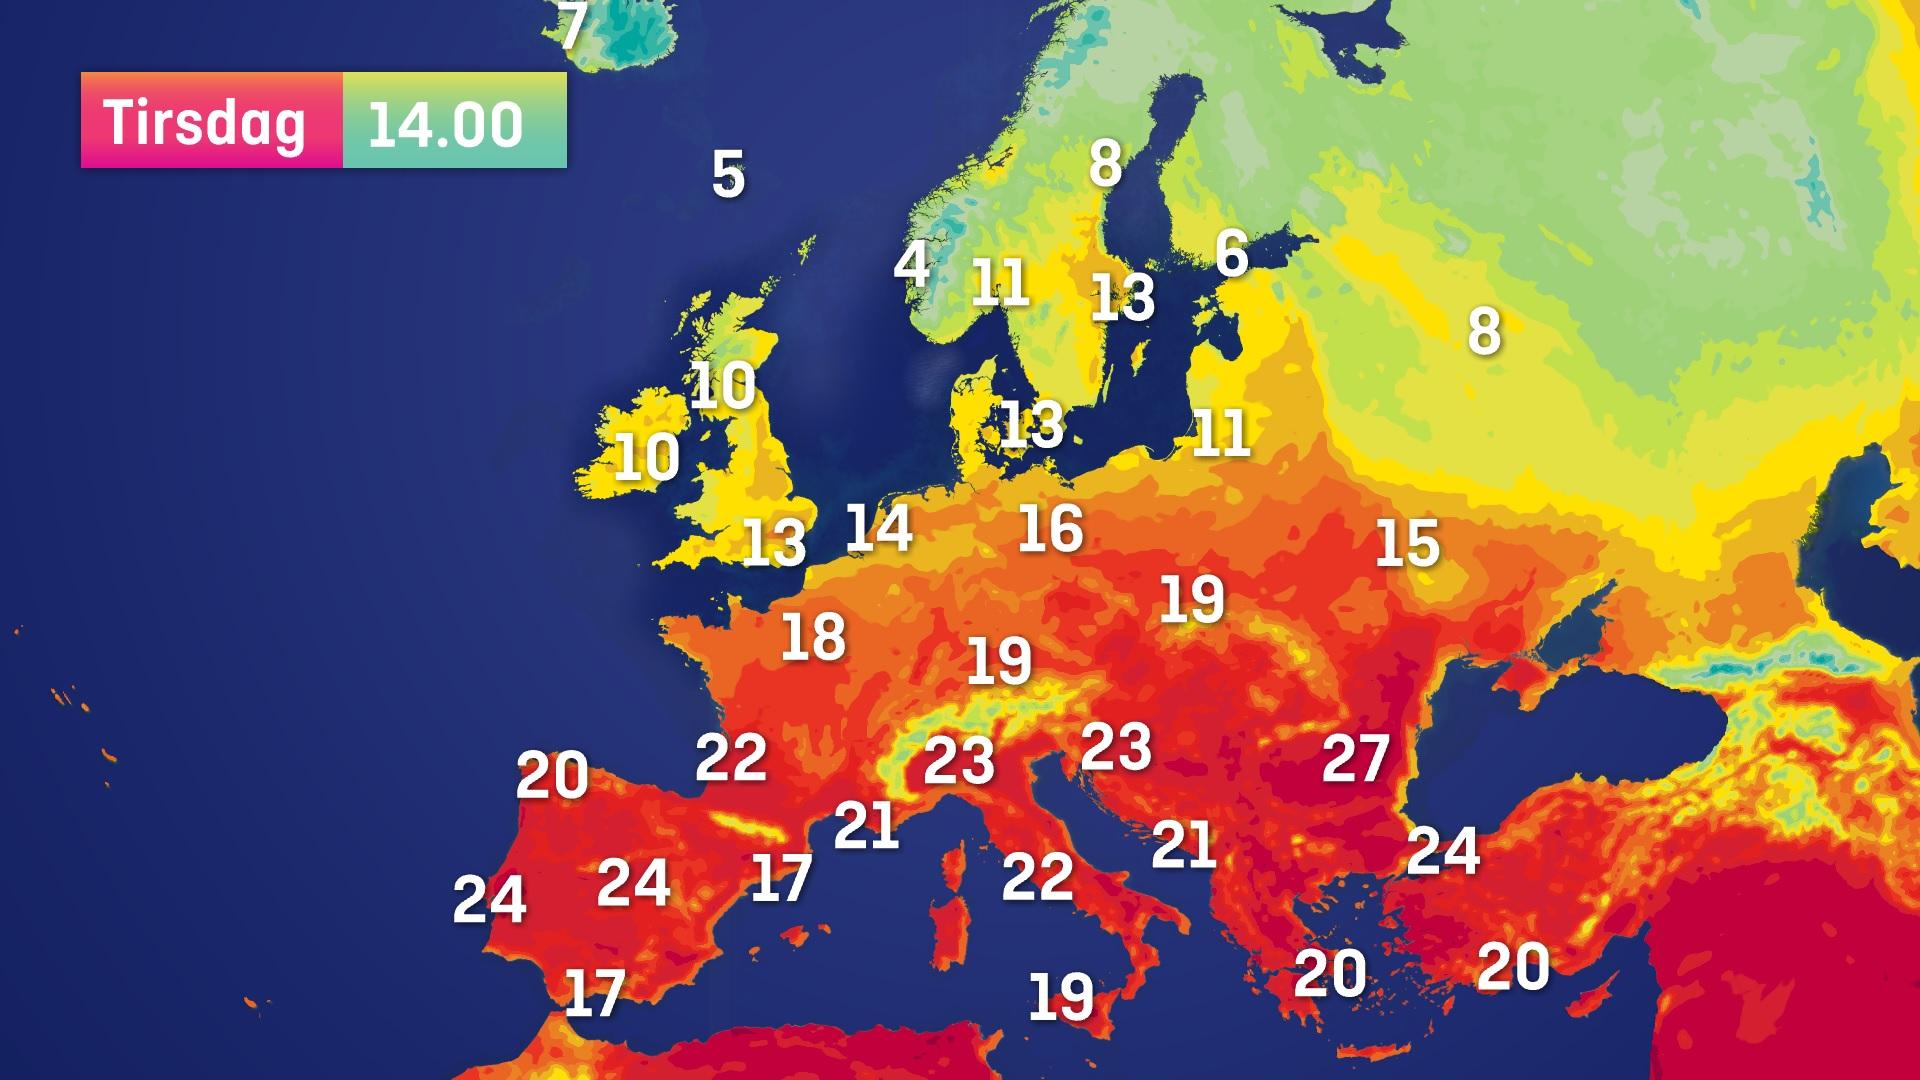 Temperaturer_i_europa